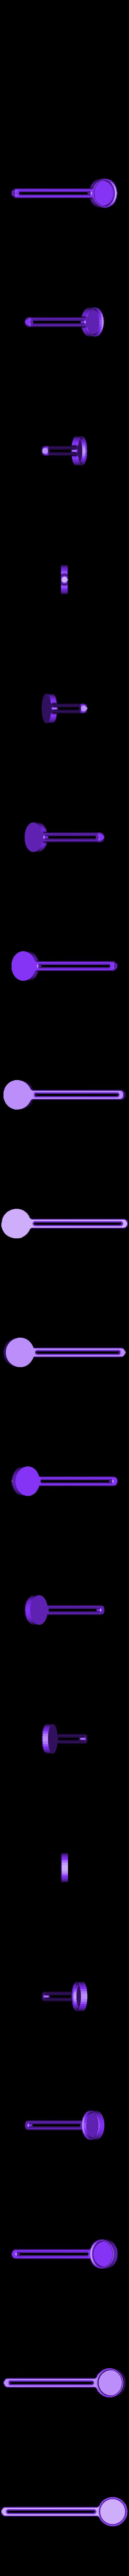 DOSER2ML85MM.stl Download free STL file THE DOSETTE KEY • 3D printable object, JeremyBarbazaStudio